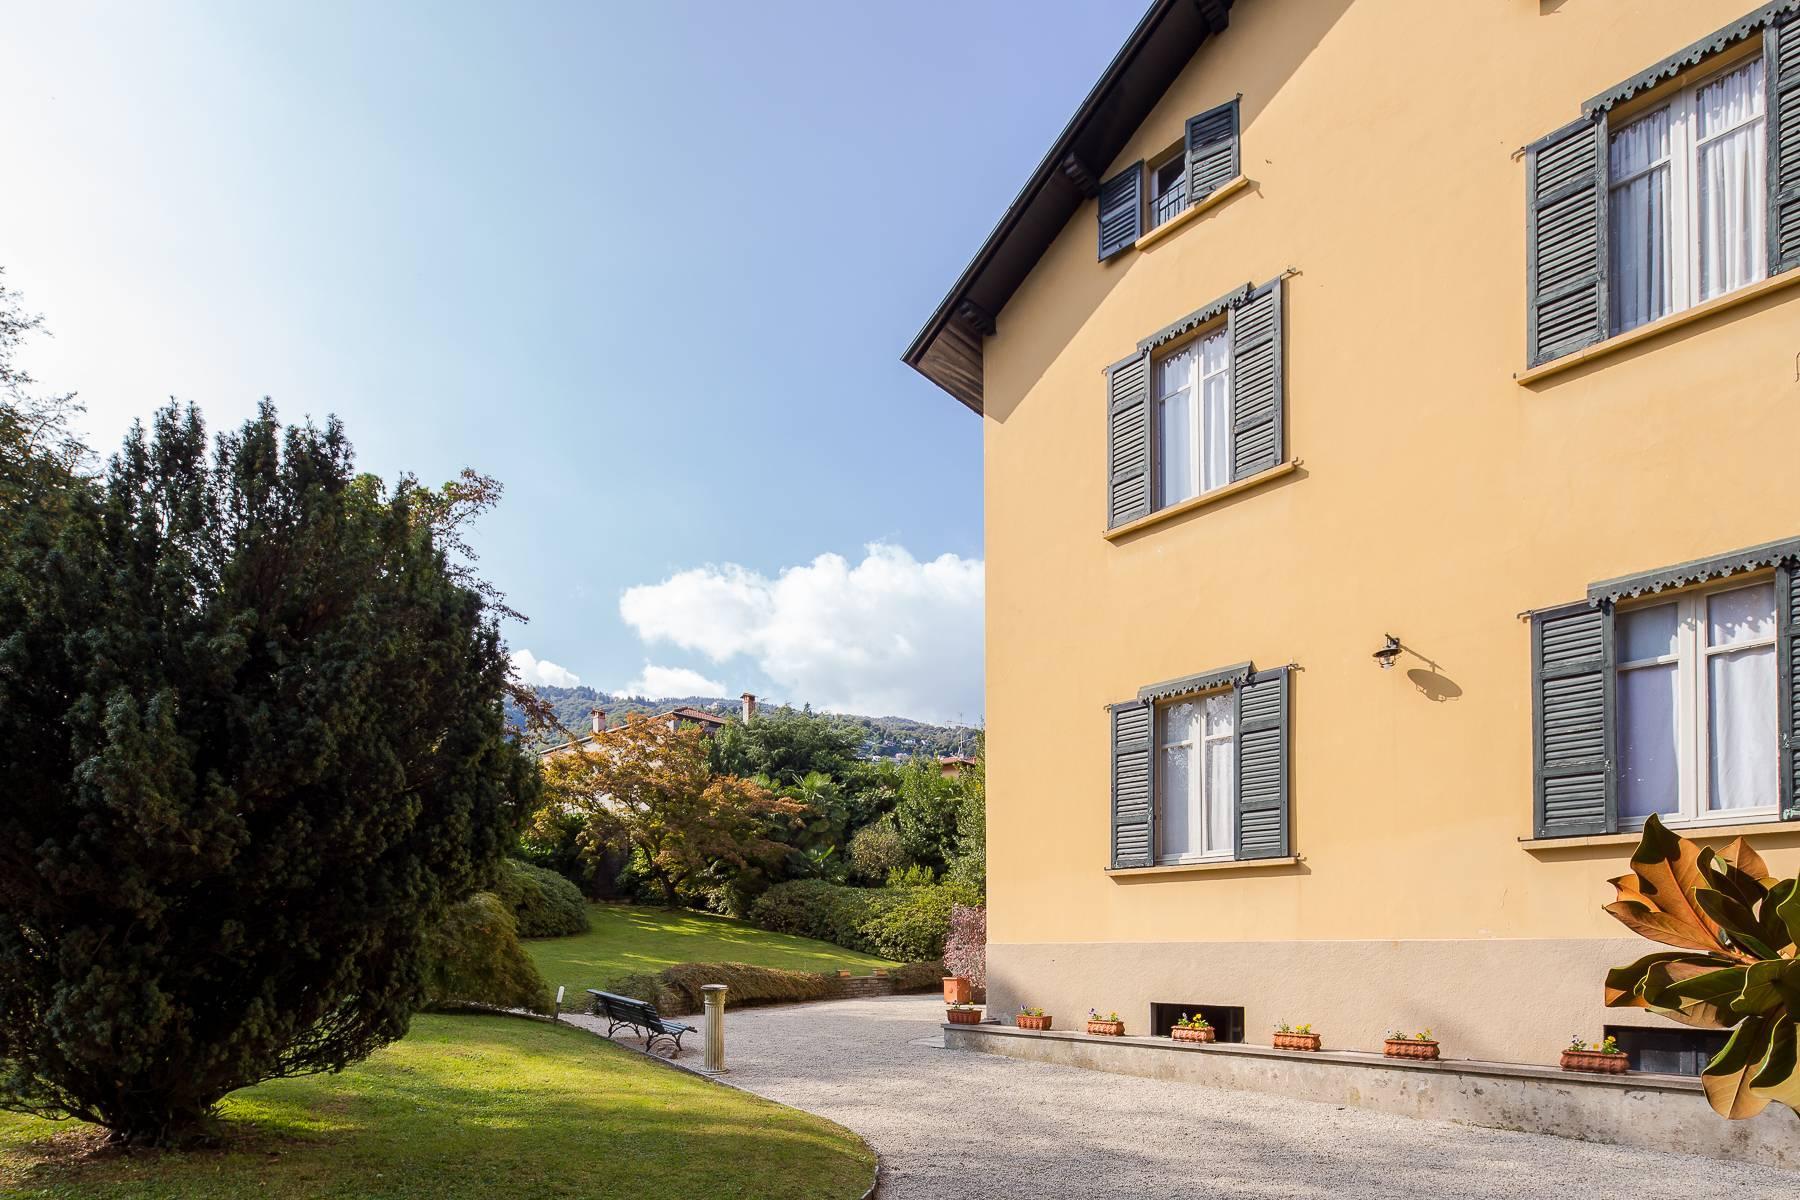 Stresa的历史中心的别墅 - 31